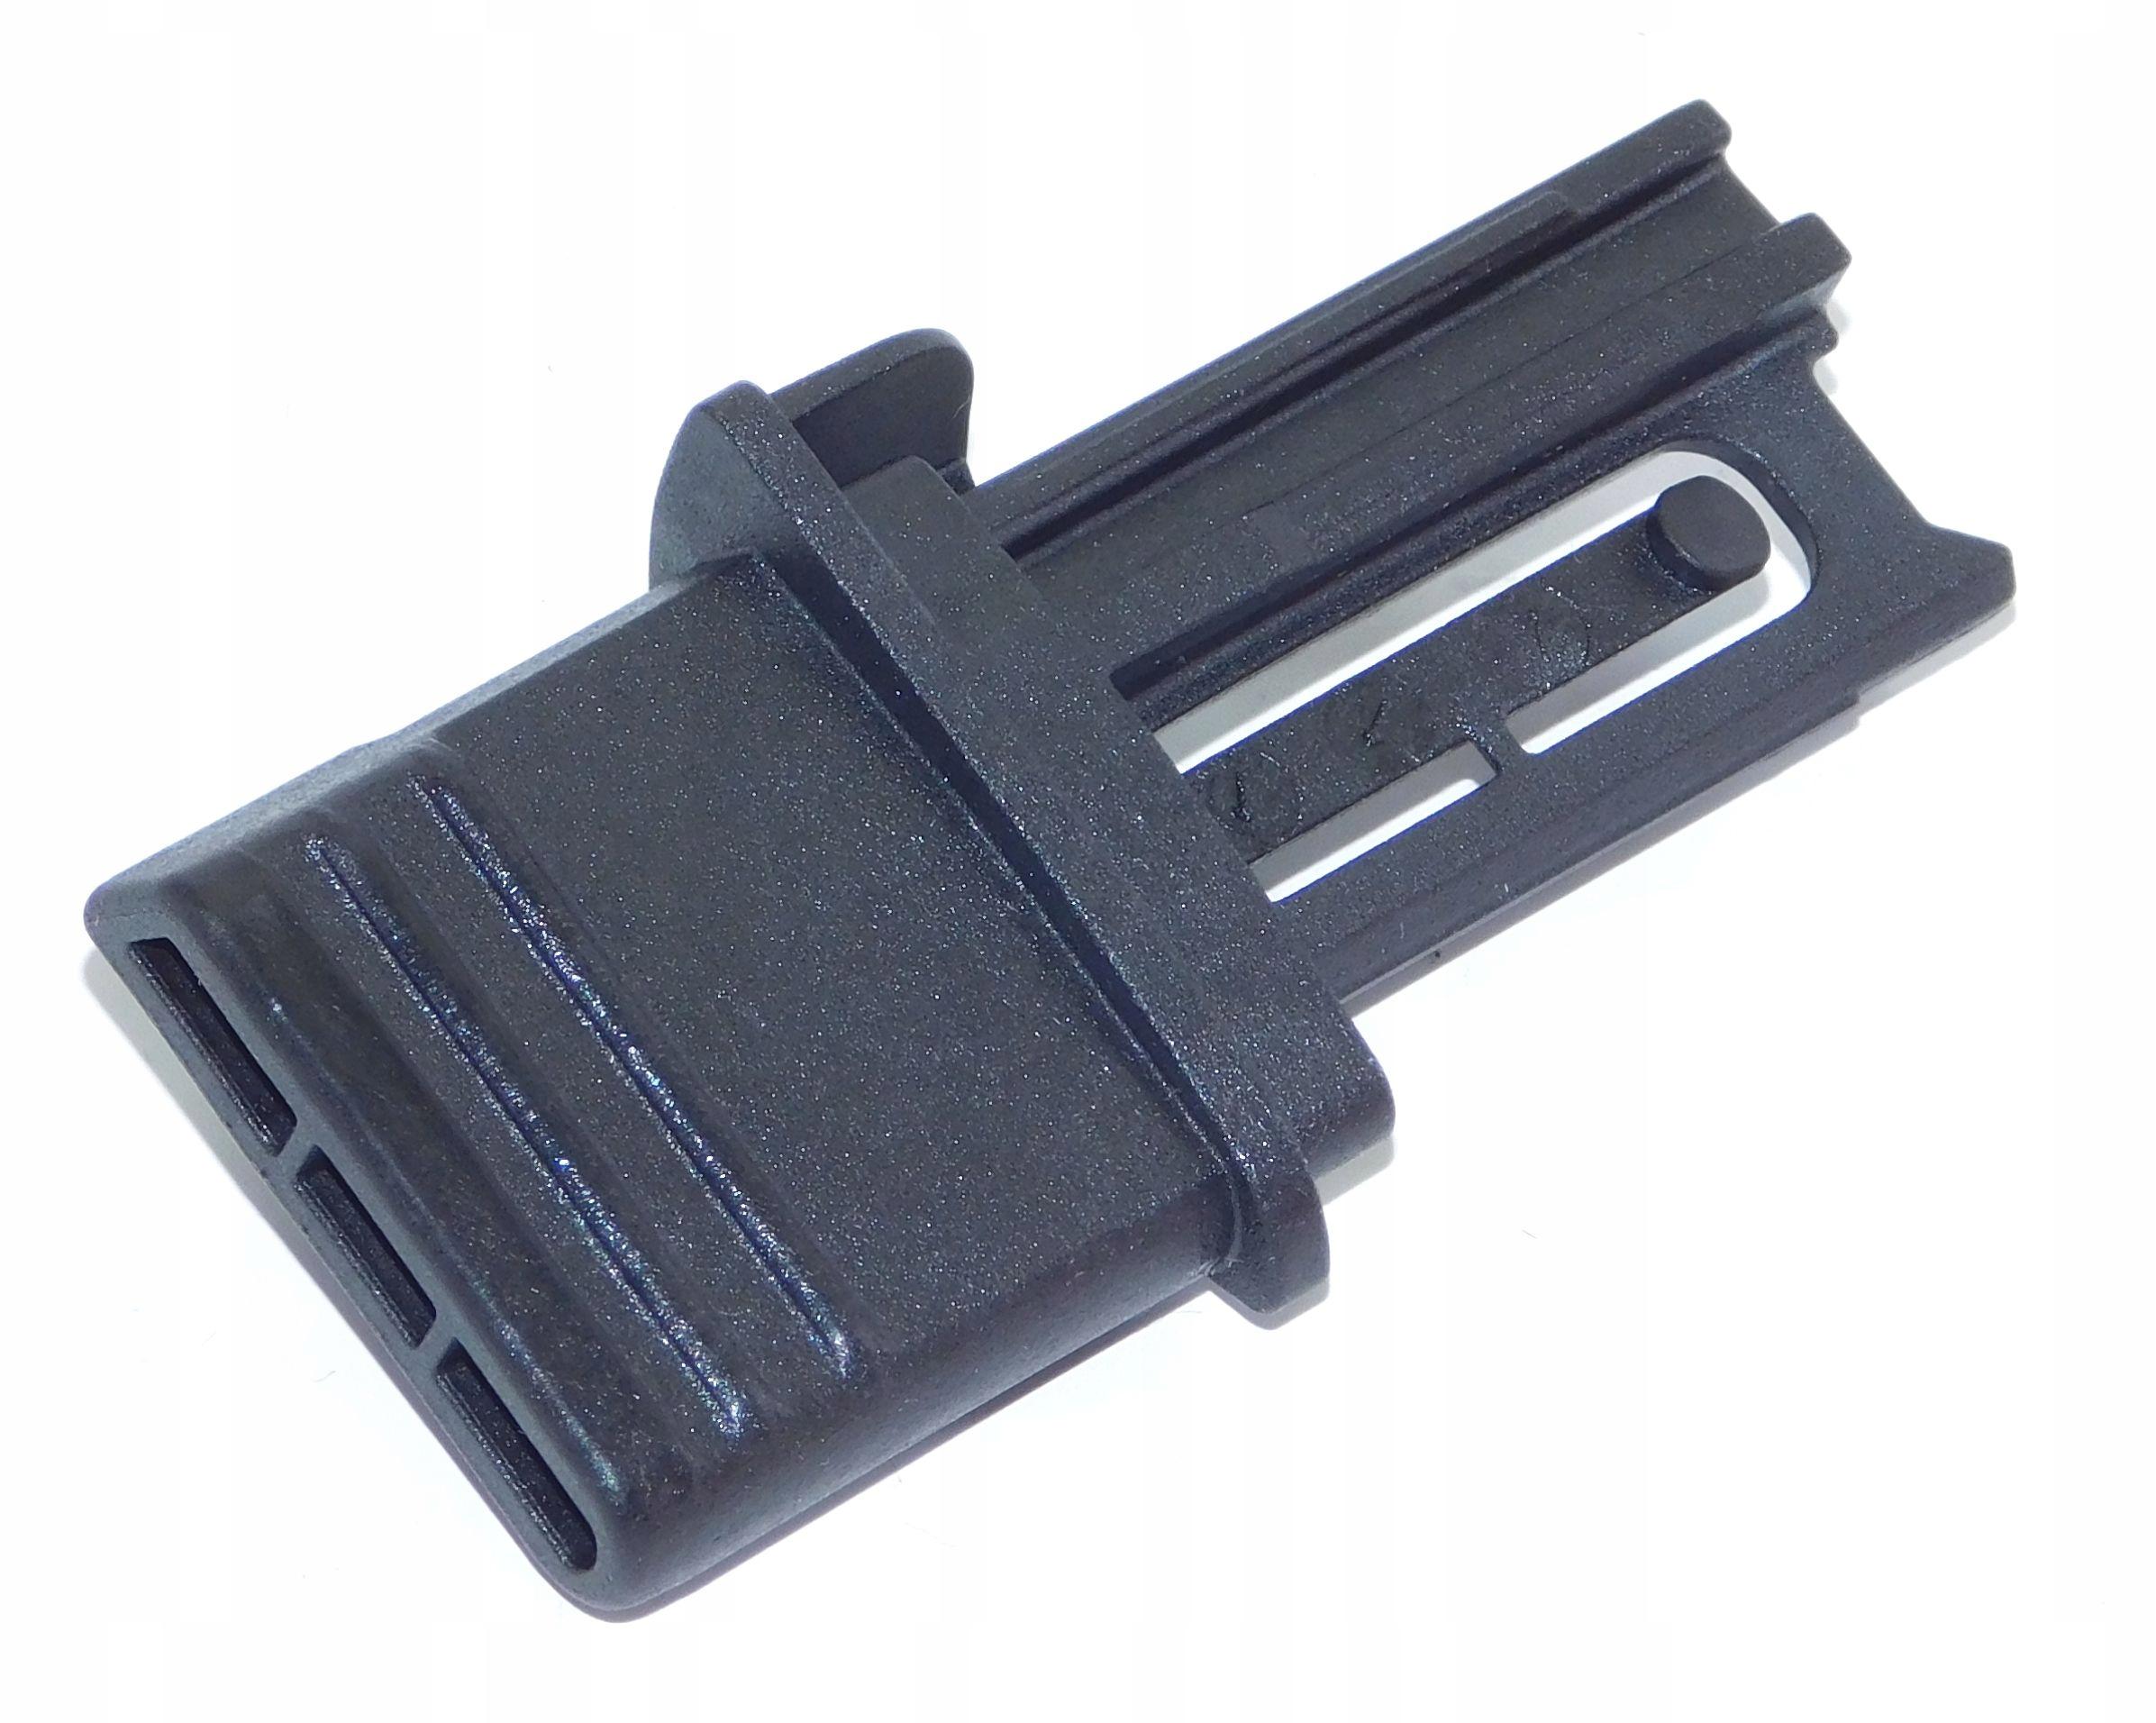 Башмак правый жалюзи багажник opel insignia a универсал